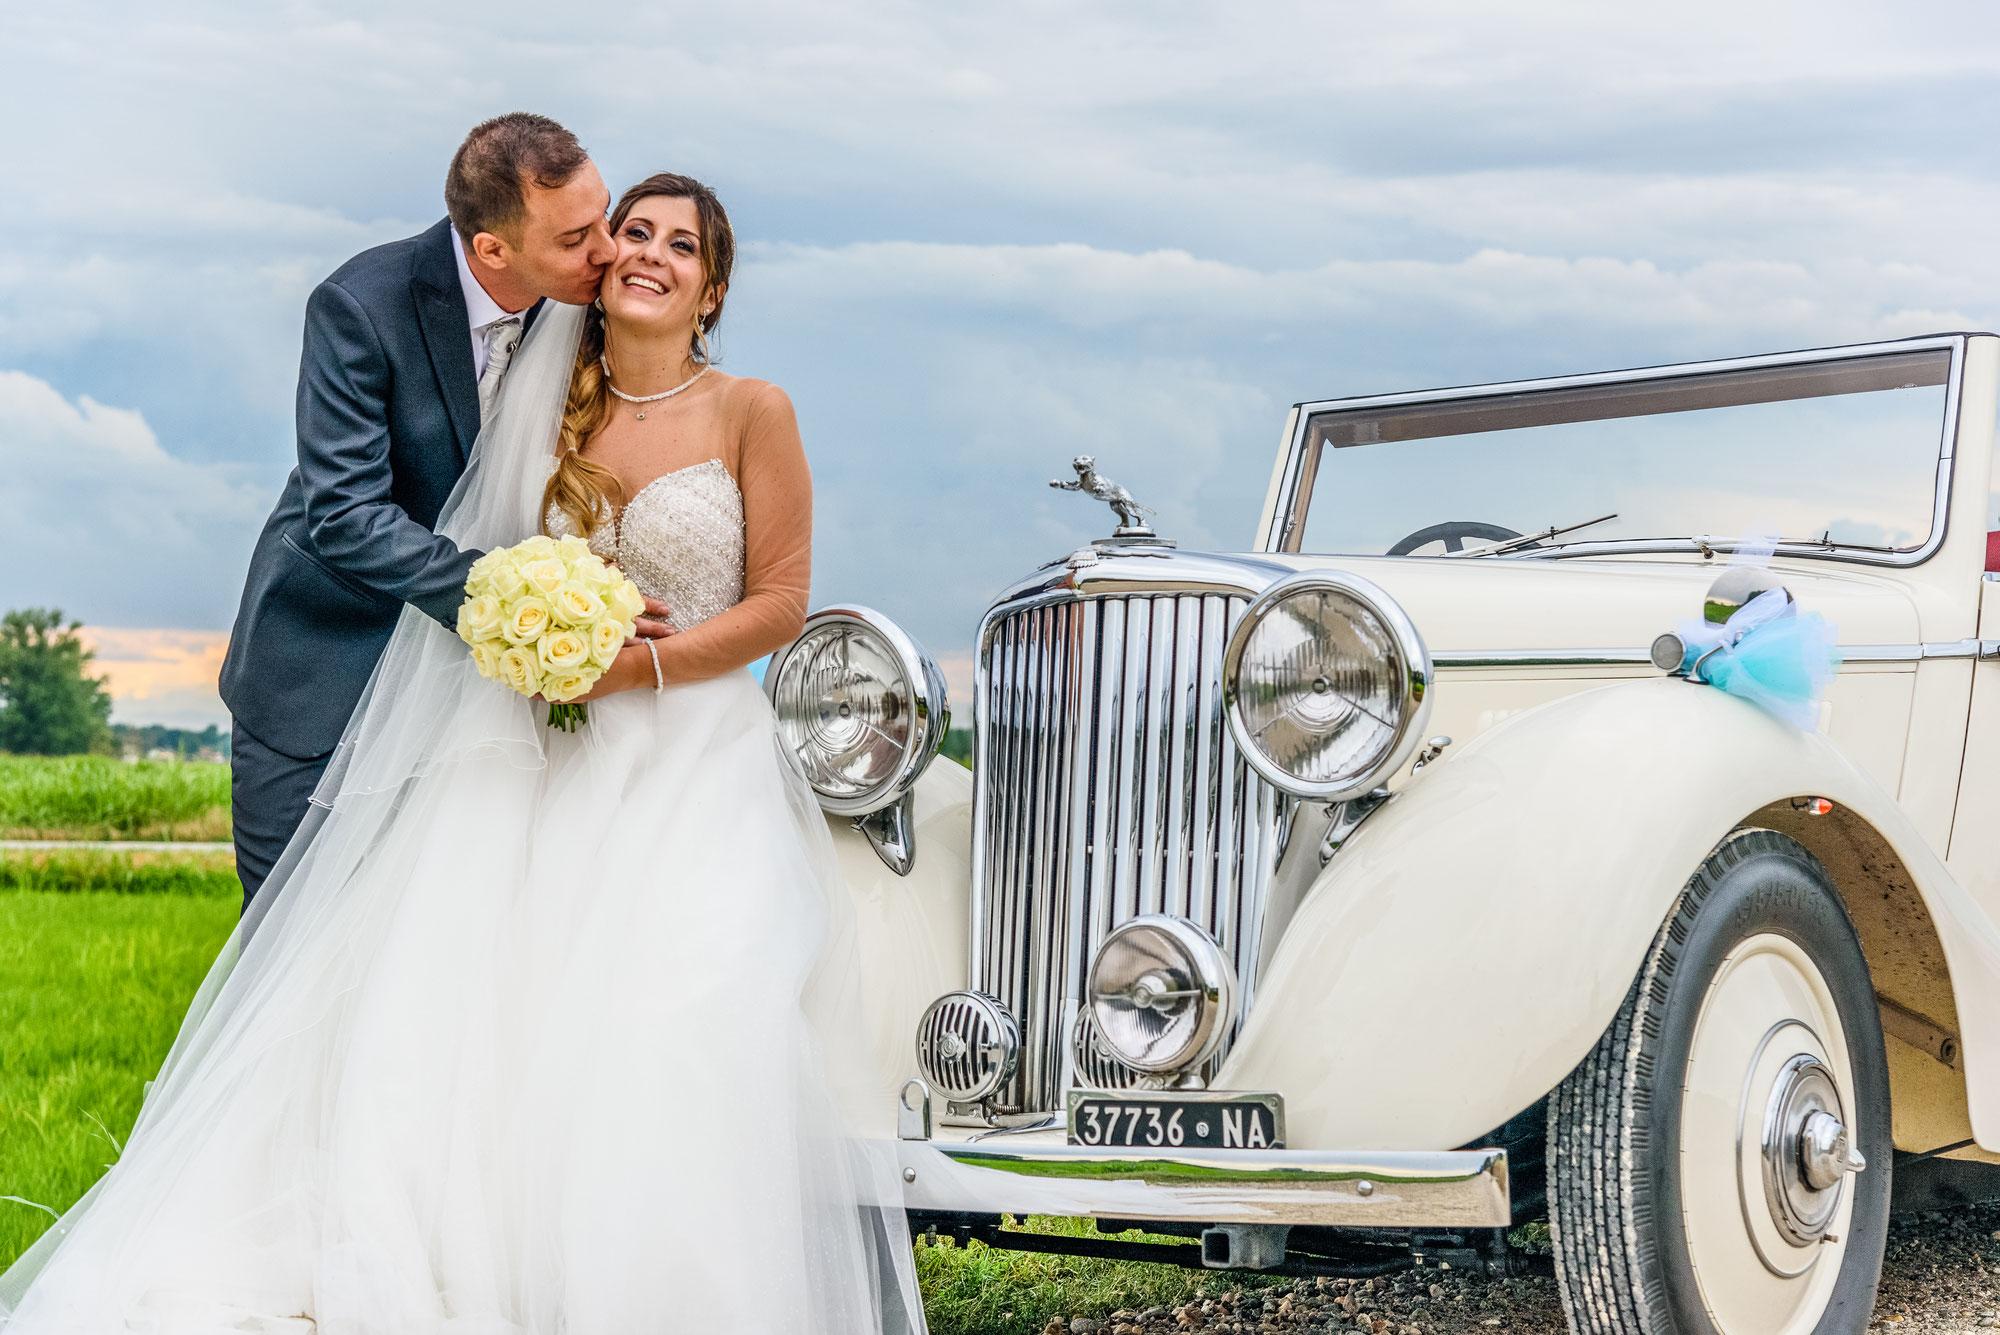 Fotografo Matrimonio Pavia - Matrimonio Cascina Barbesina